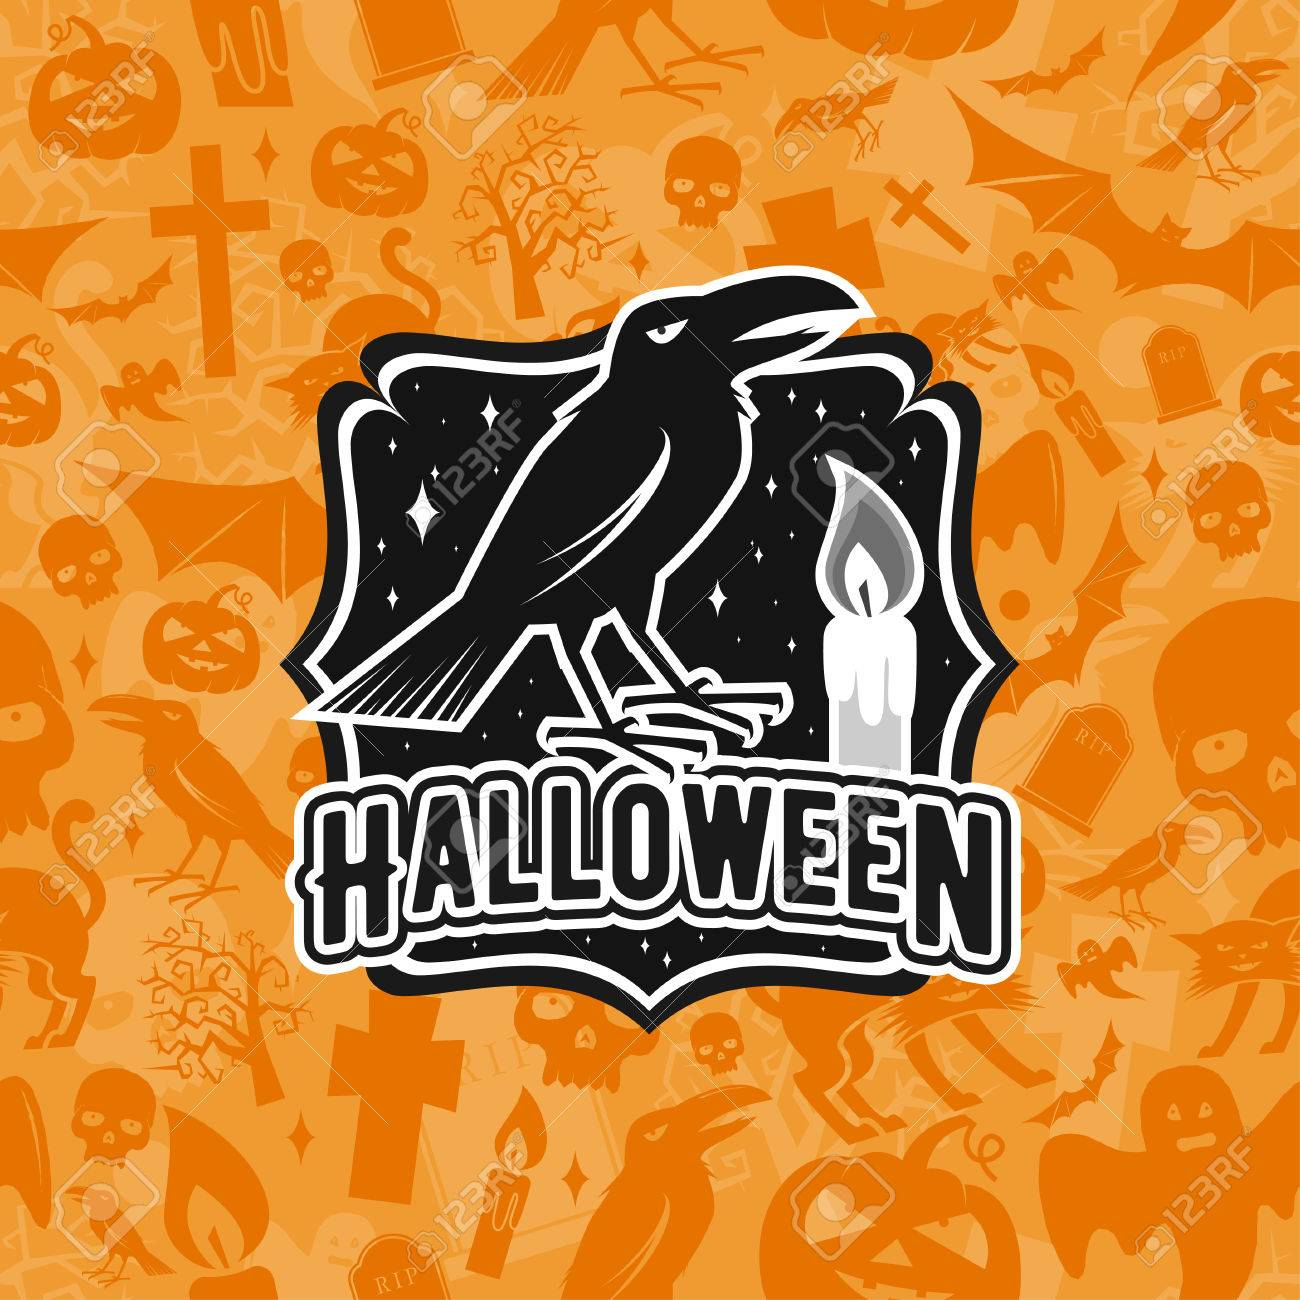 Halloween-Vintage-Abzeichen, Emblem Oder Label. Vektor-Illustration ...